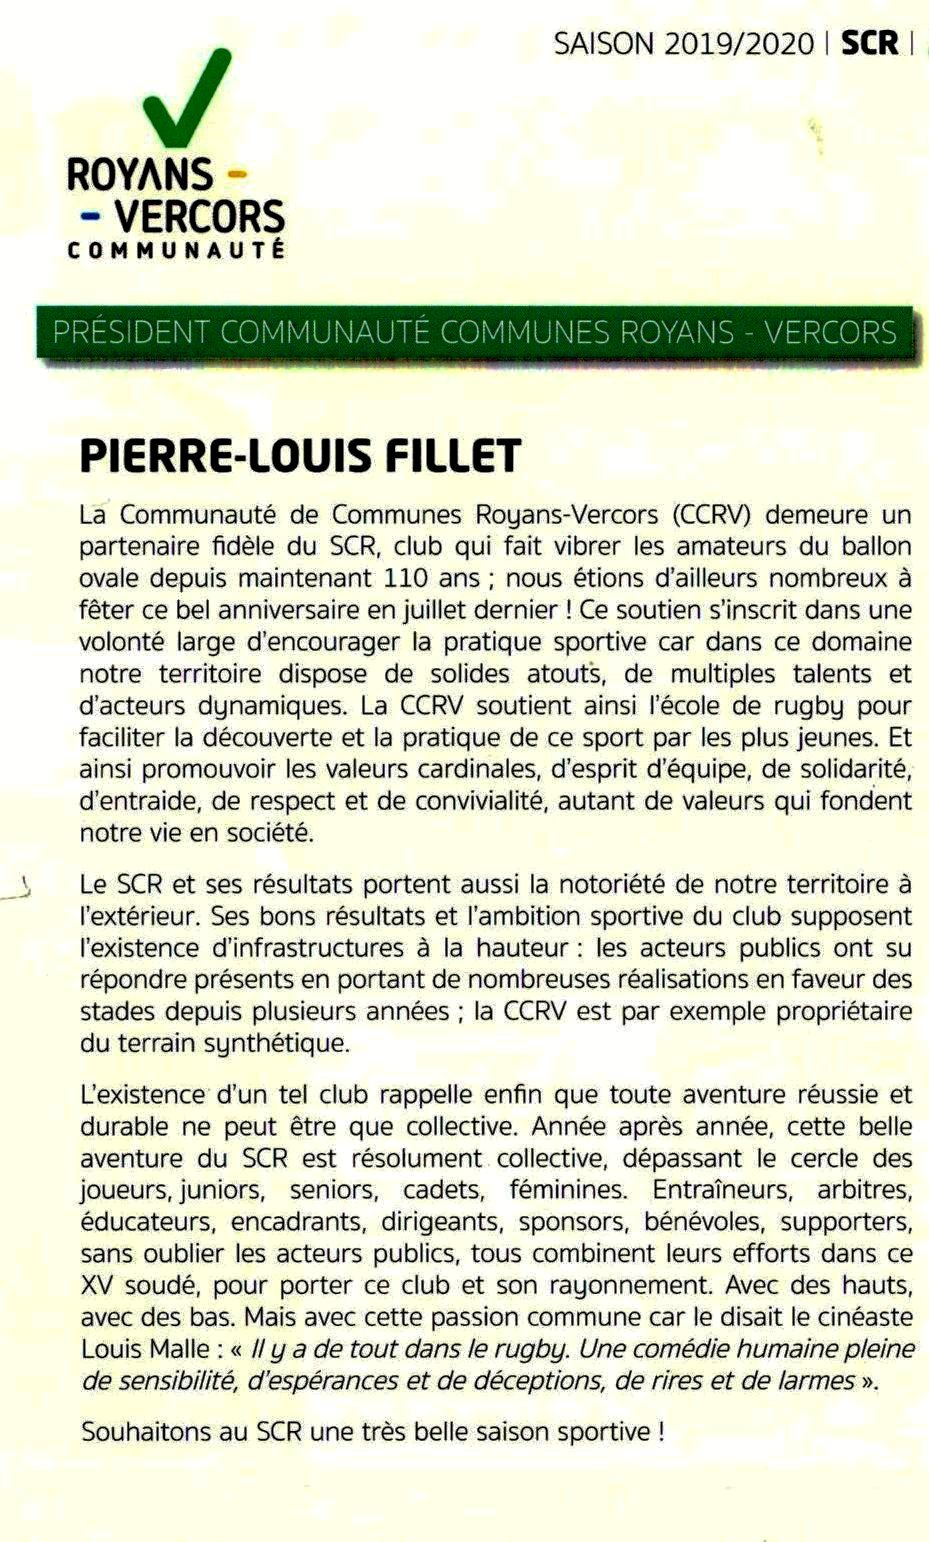 Pierre Louis Fillet